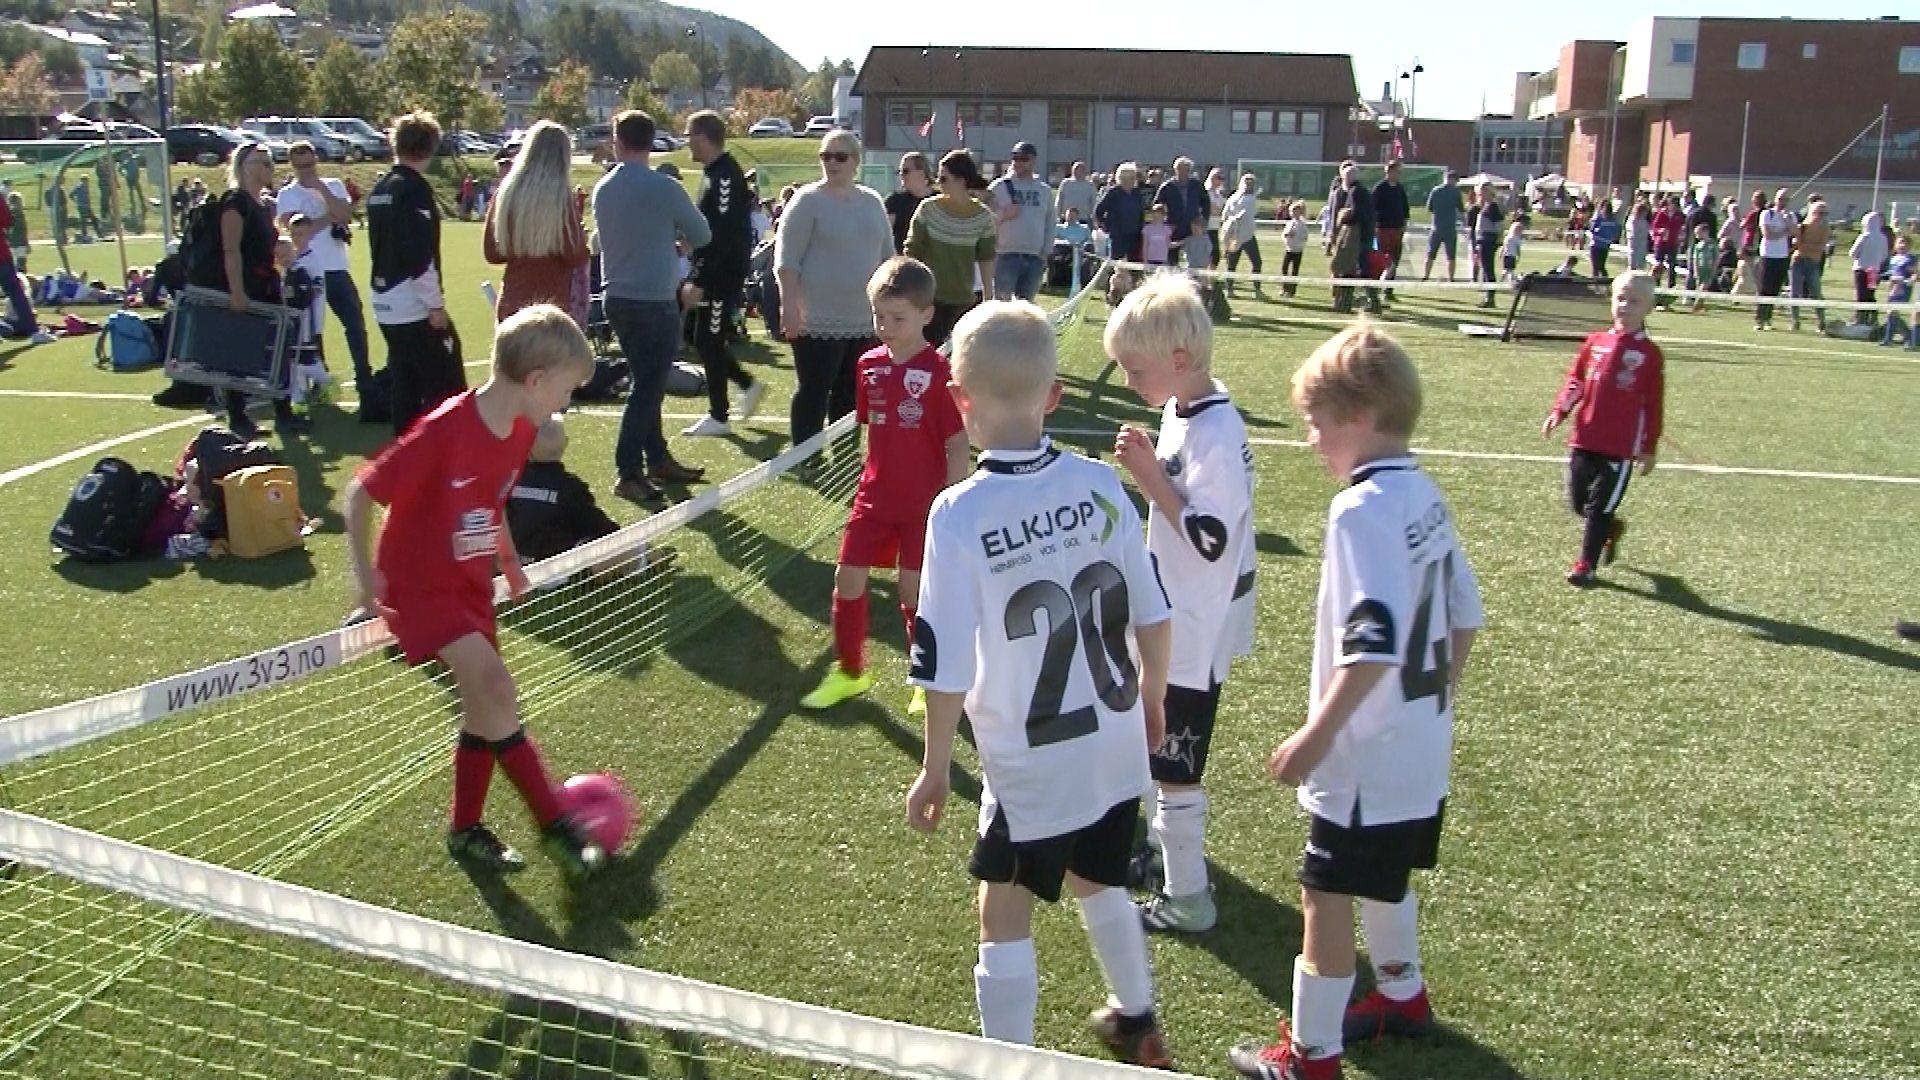 Avlyser Åmotsenter-cup i fotball